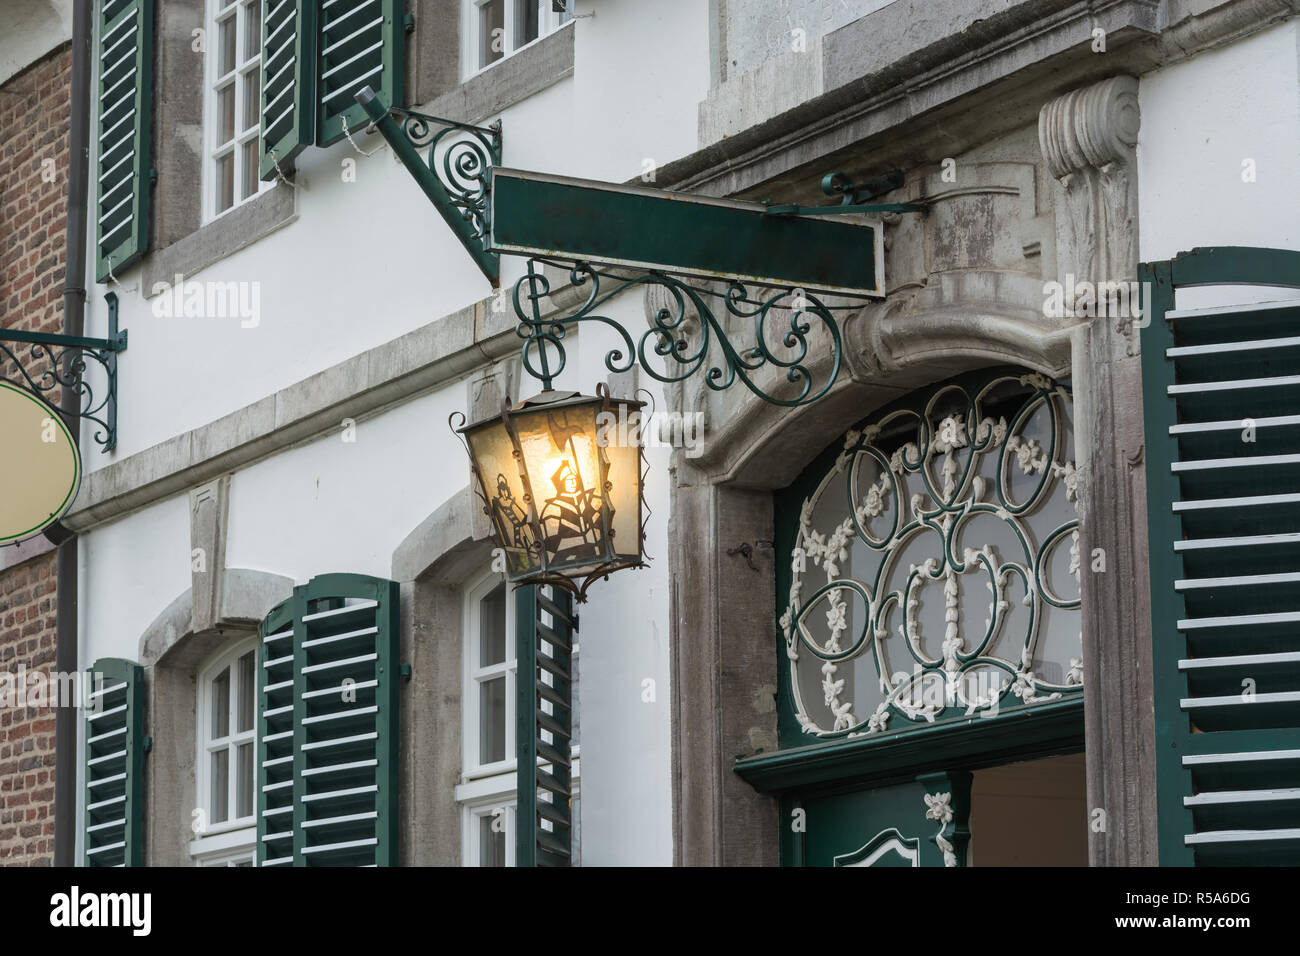 medieval lit streets lantern - Stock Image